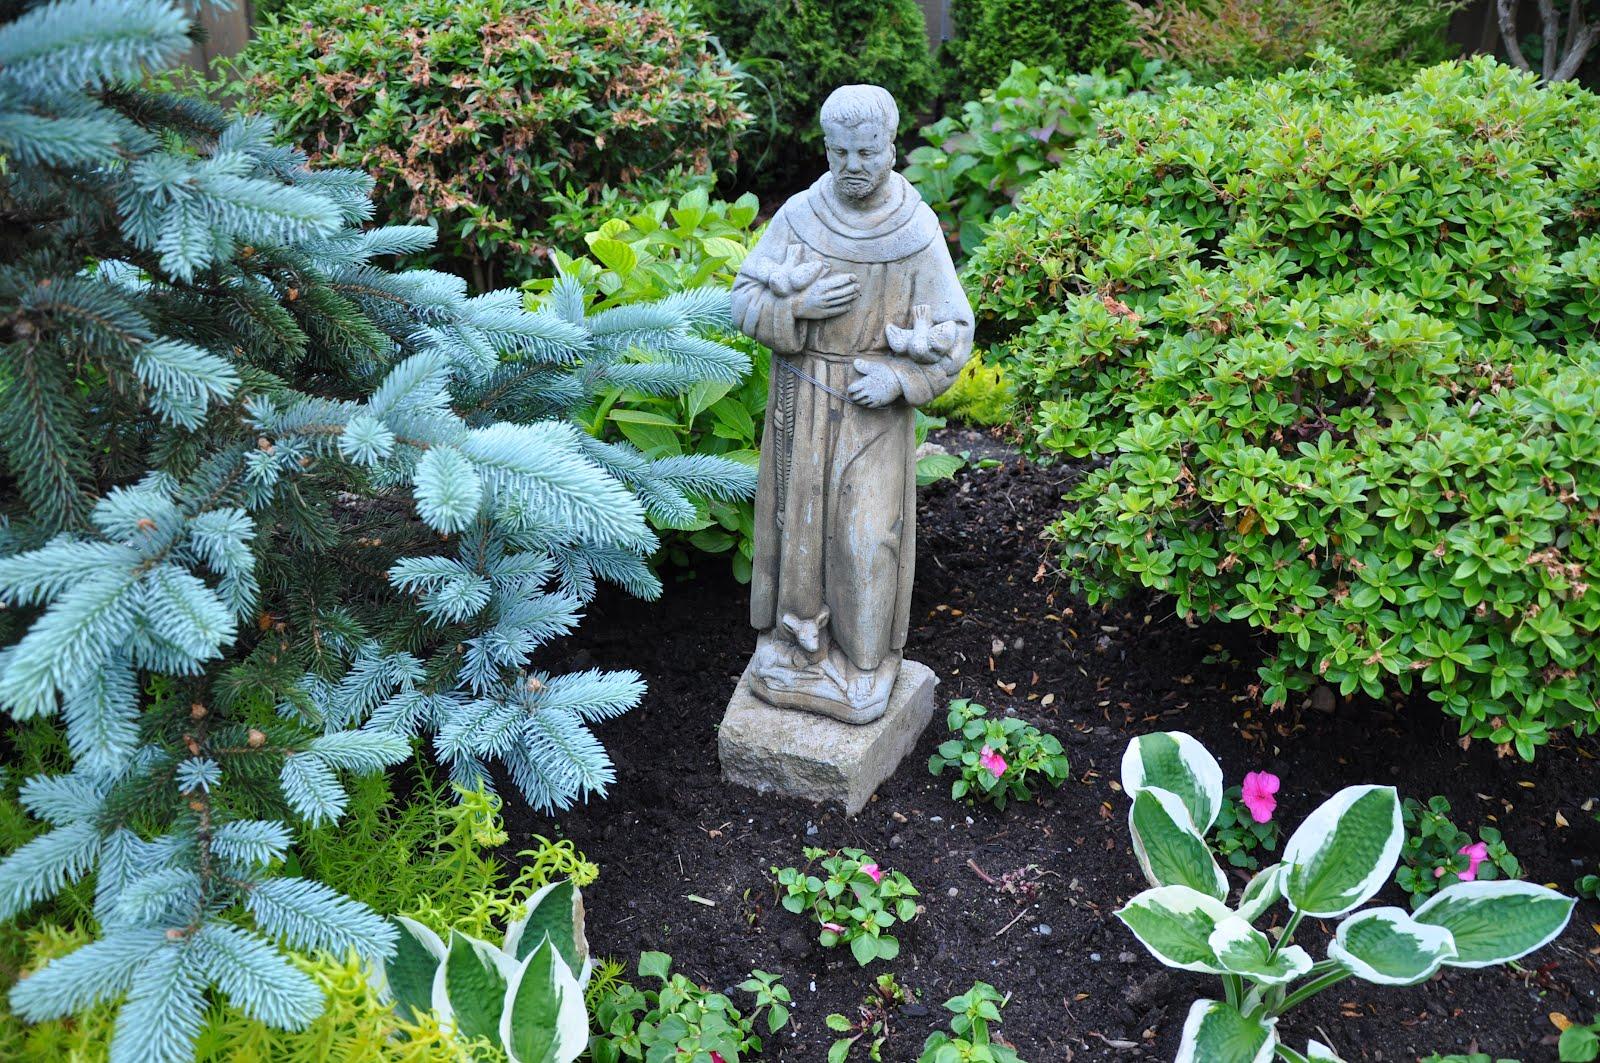 Incroyable Ourdoor Garden Statue Of St. Francis